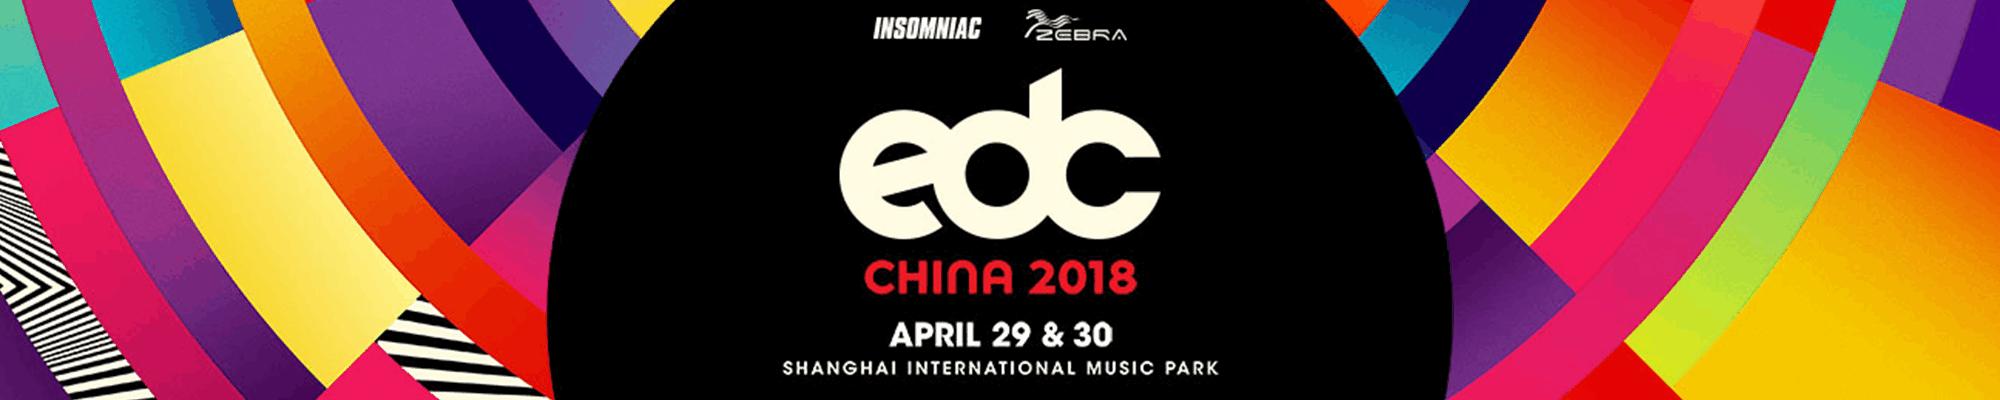 EDC CHINA 2018 in Shanghai